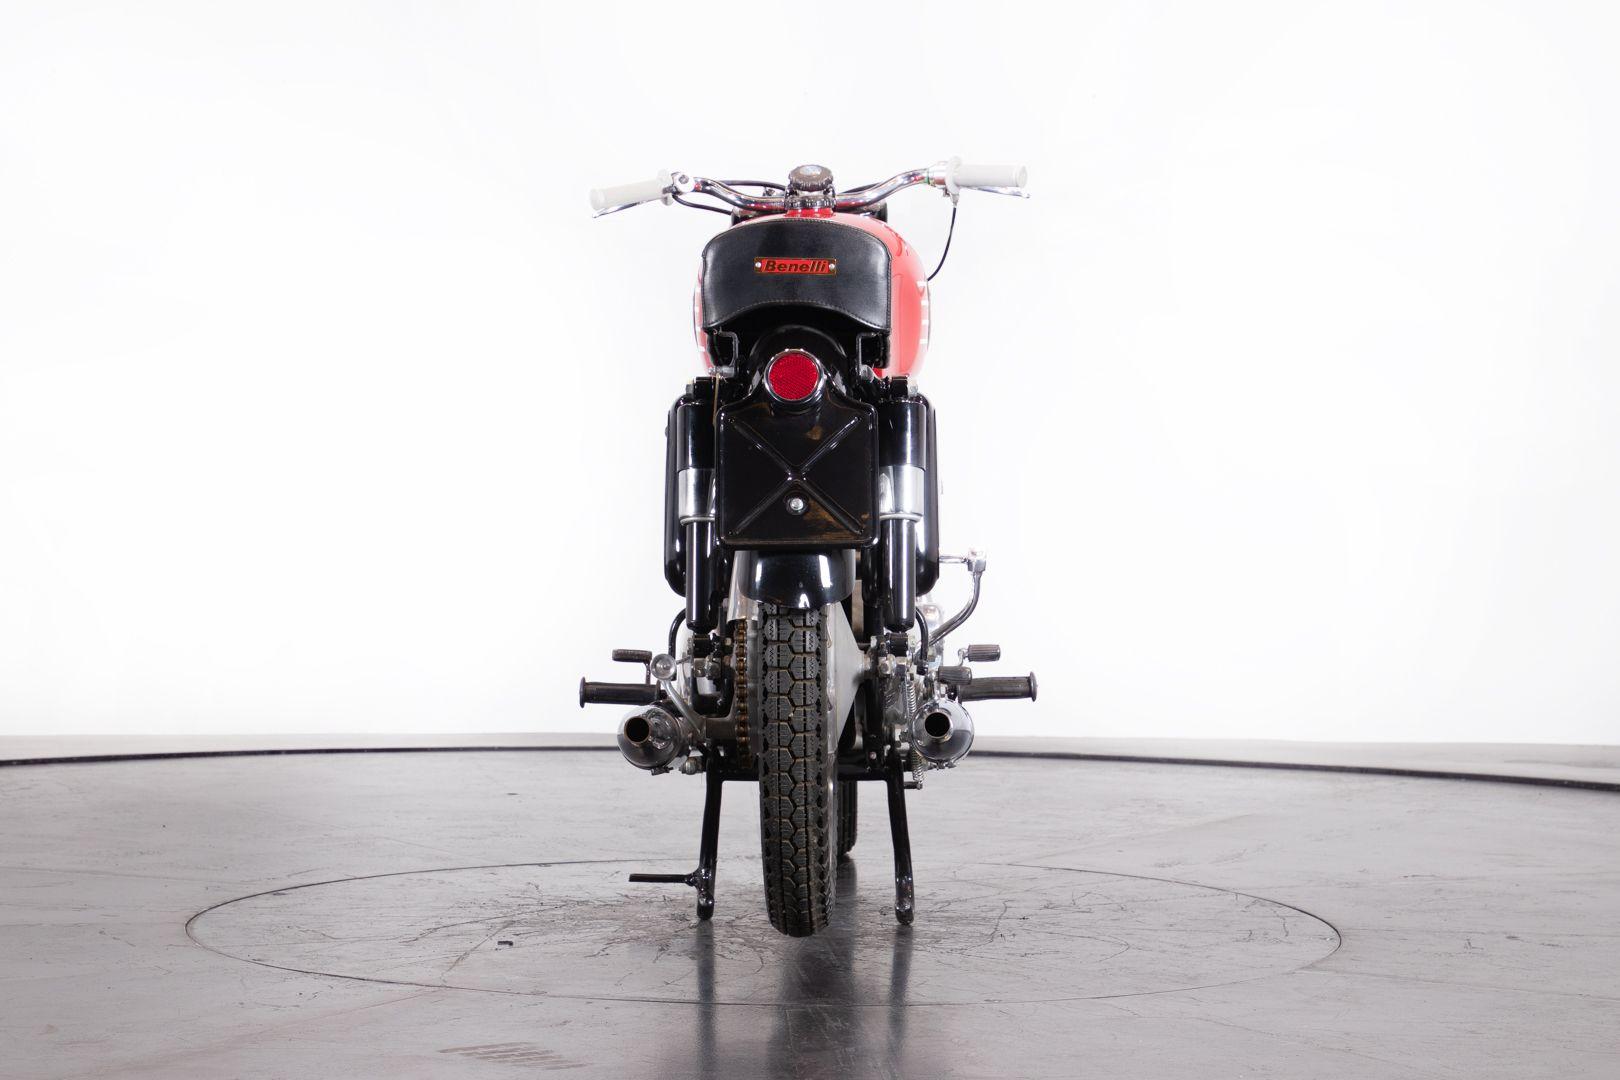 1955 Benelli 250 Leonessa 74302